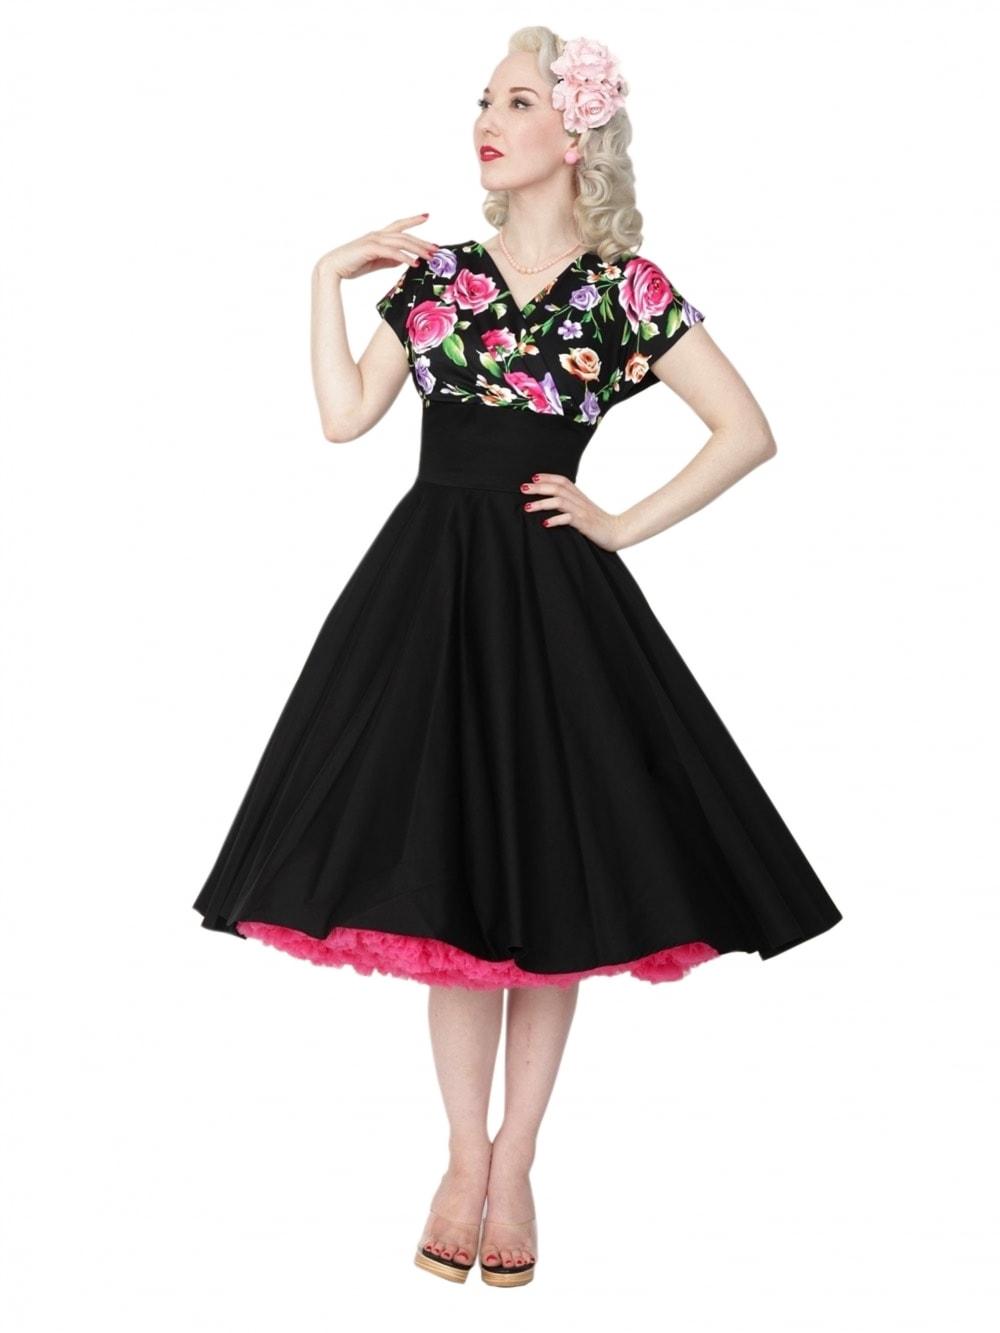 Grace Dress Floral Noir Bust from Vivien of Holloway